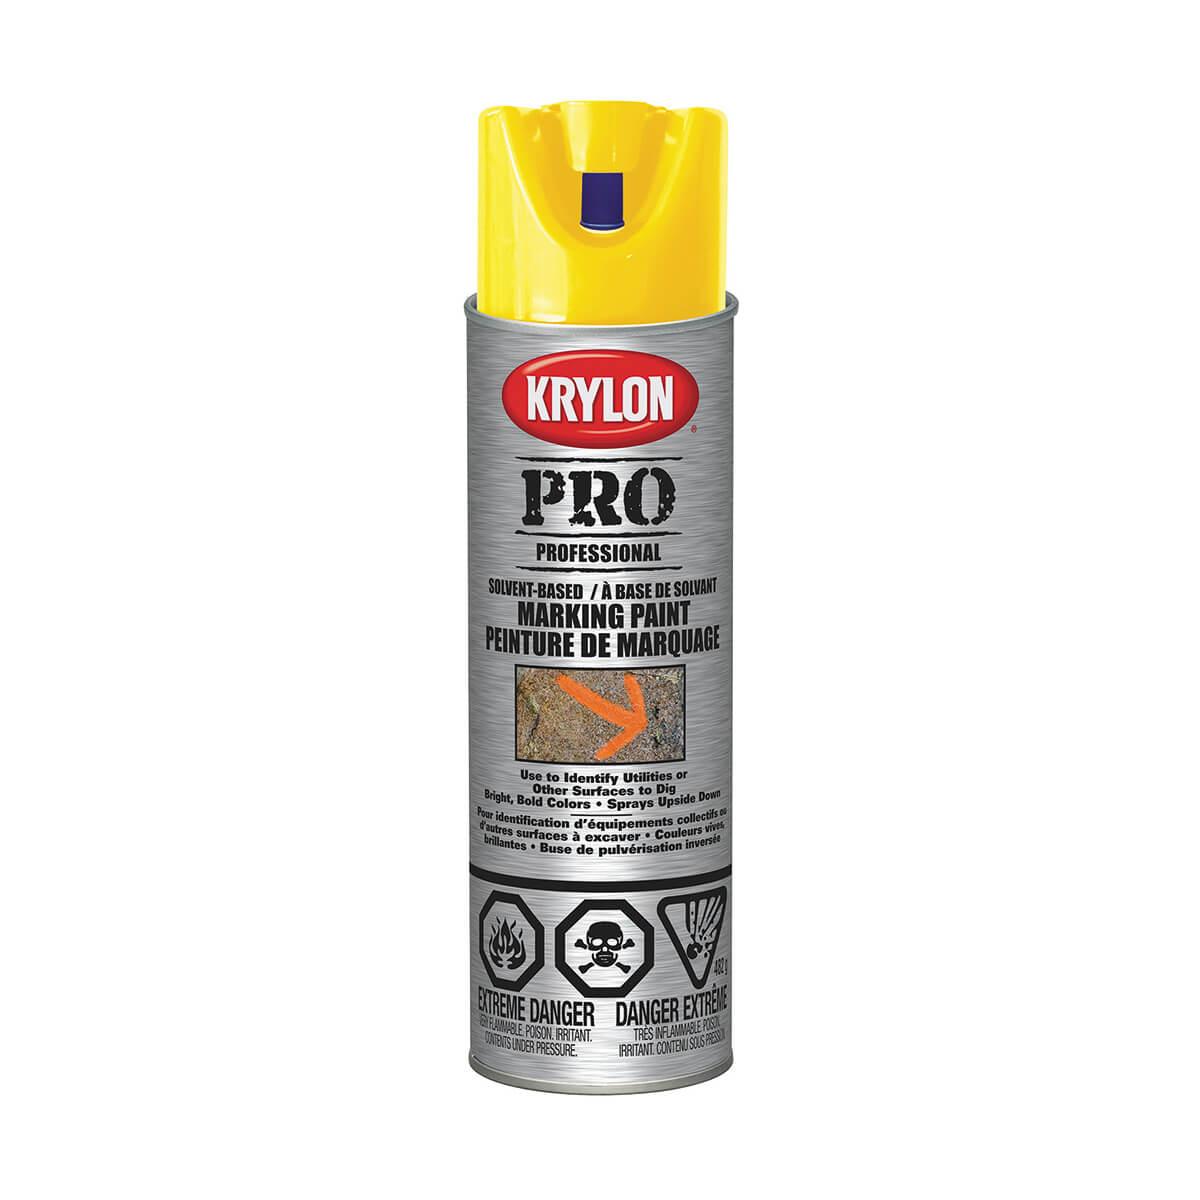 Krylon contractor marking paint, Solvent based, APWA Yellow - 482 g